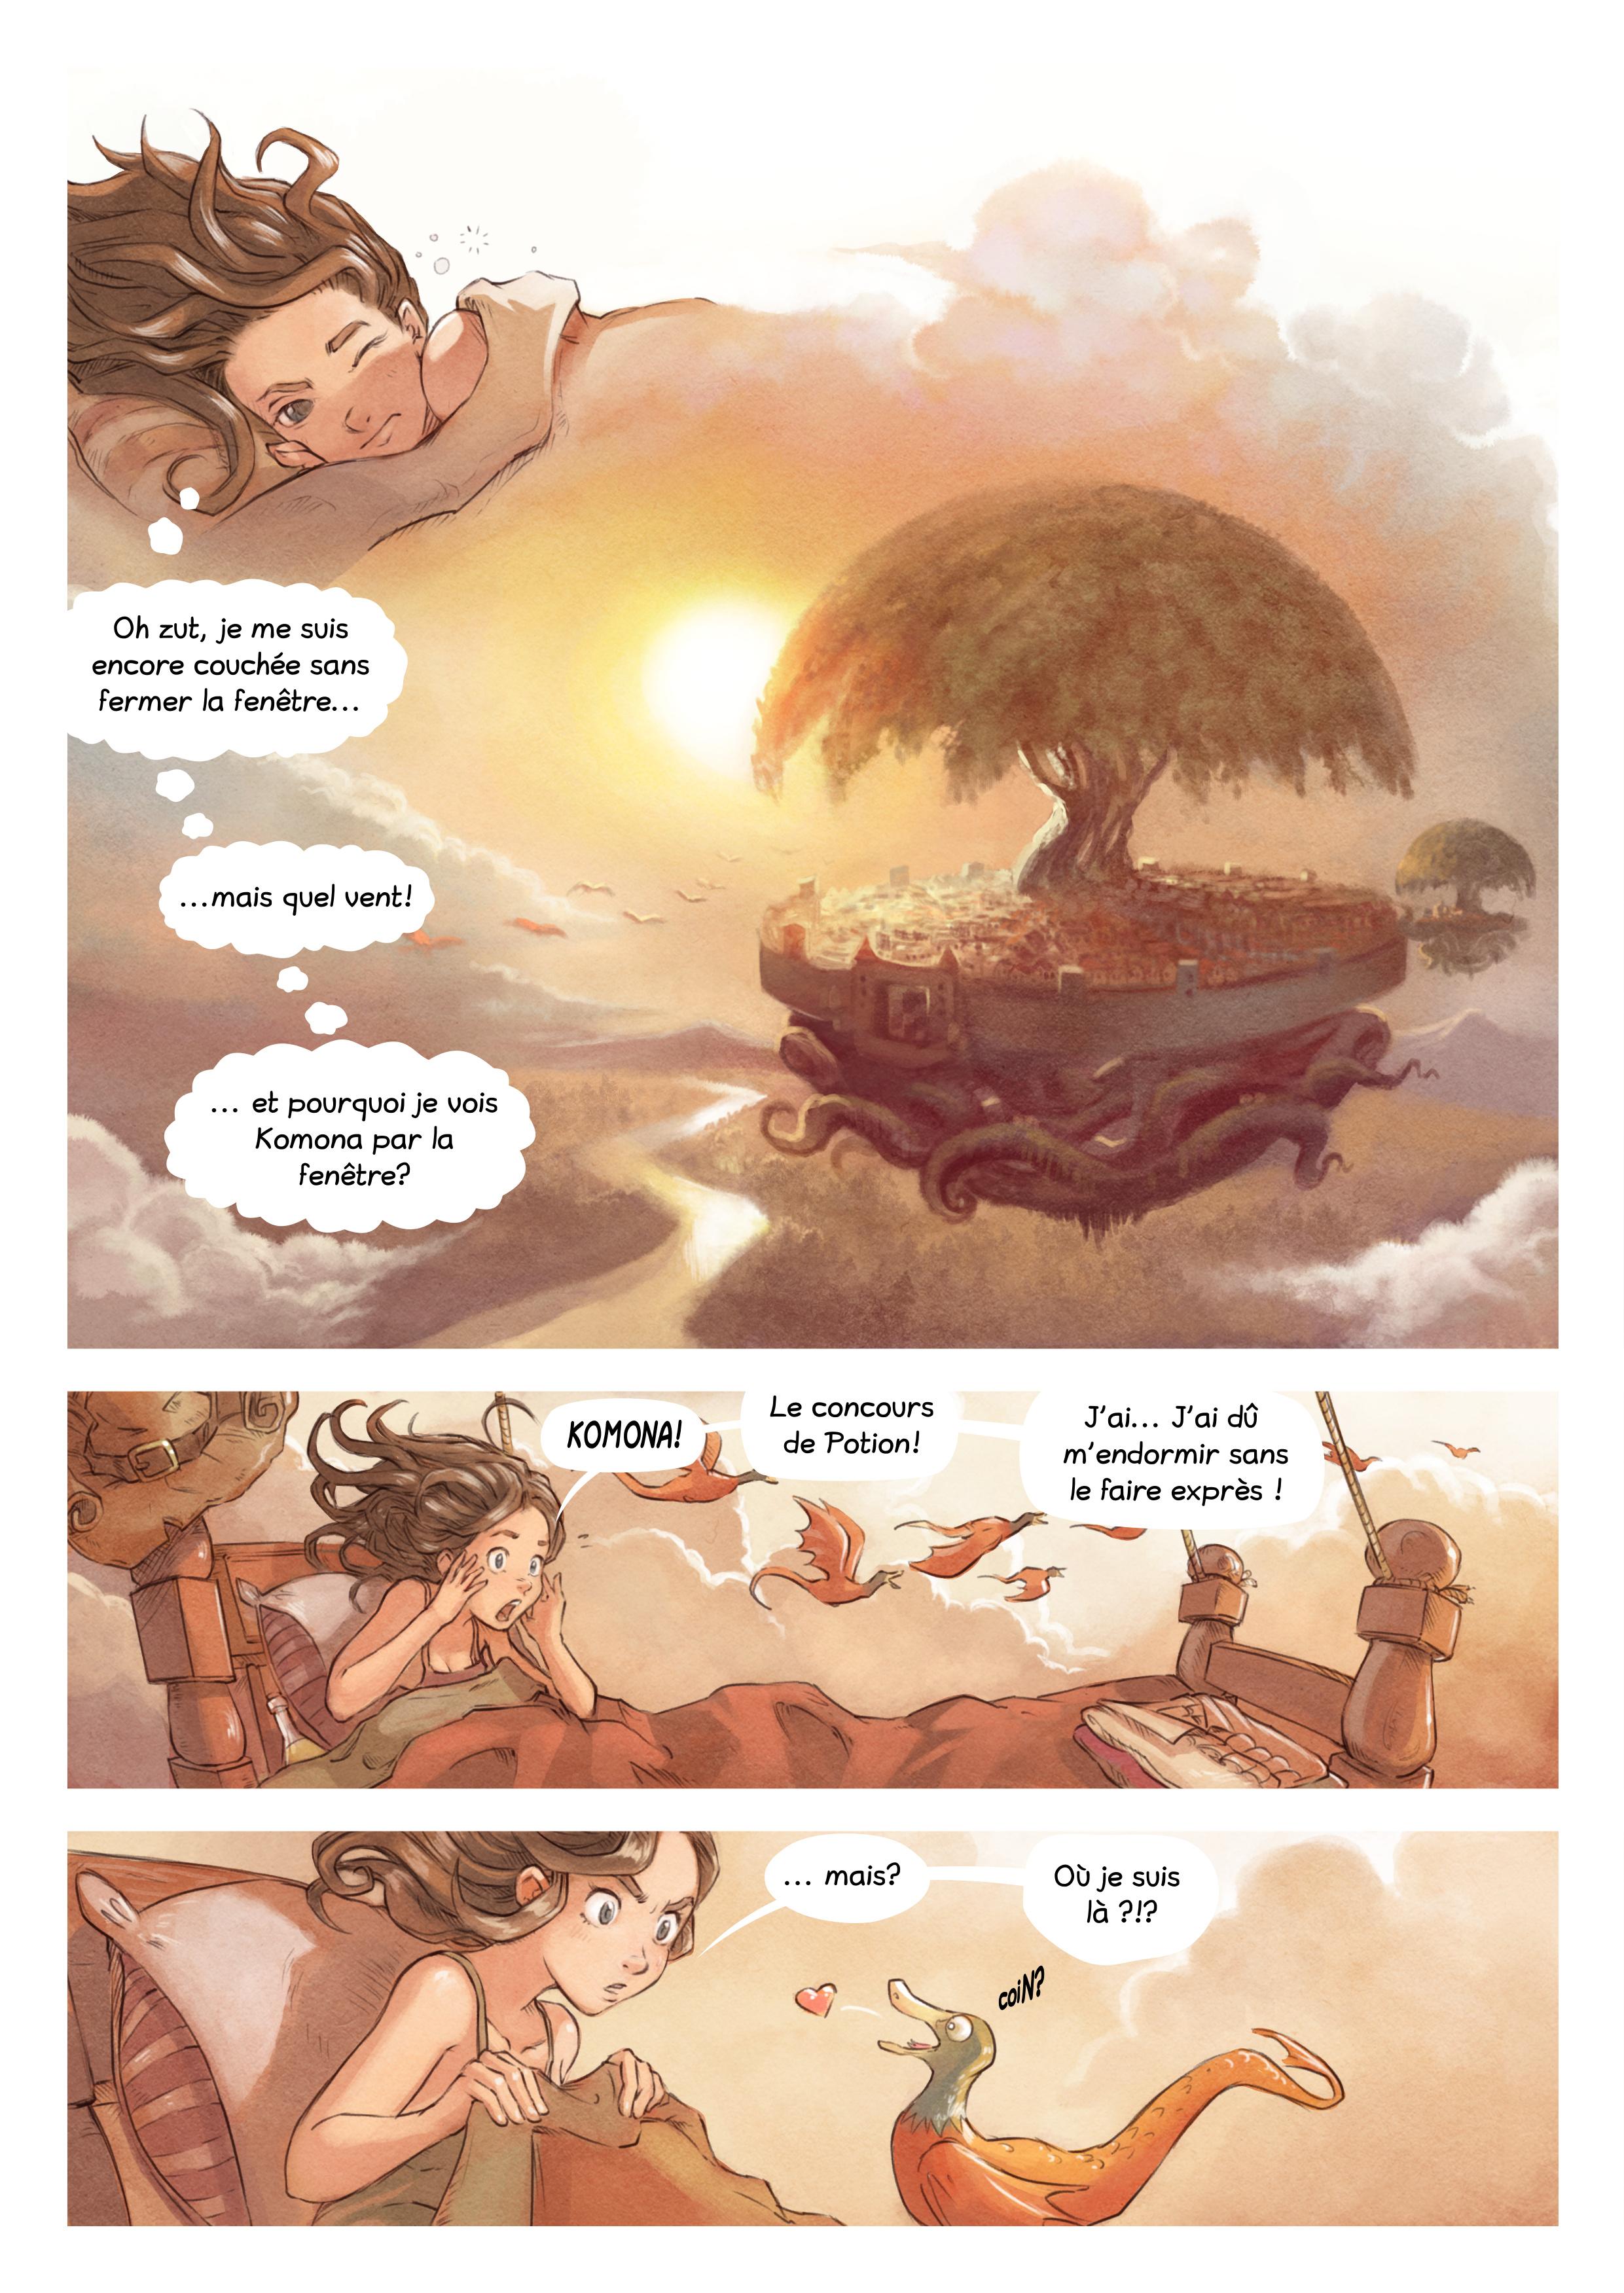 A webcomic page of Pepper&Carrot, épisode 6 [fr], page 1